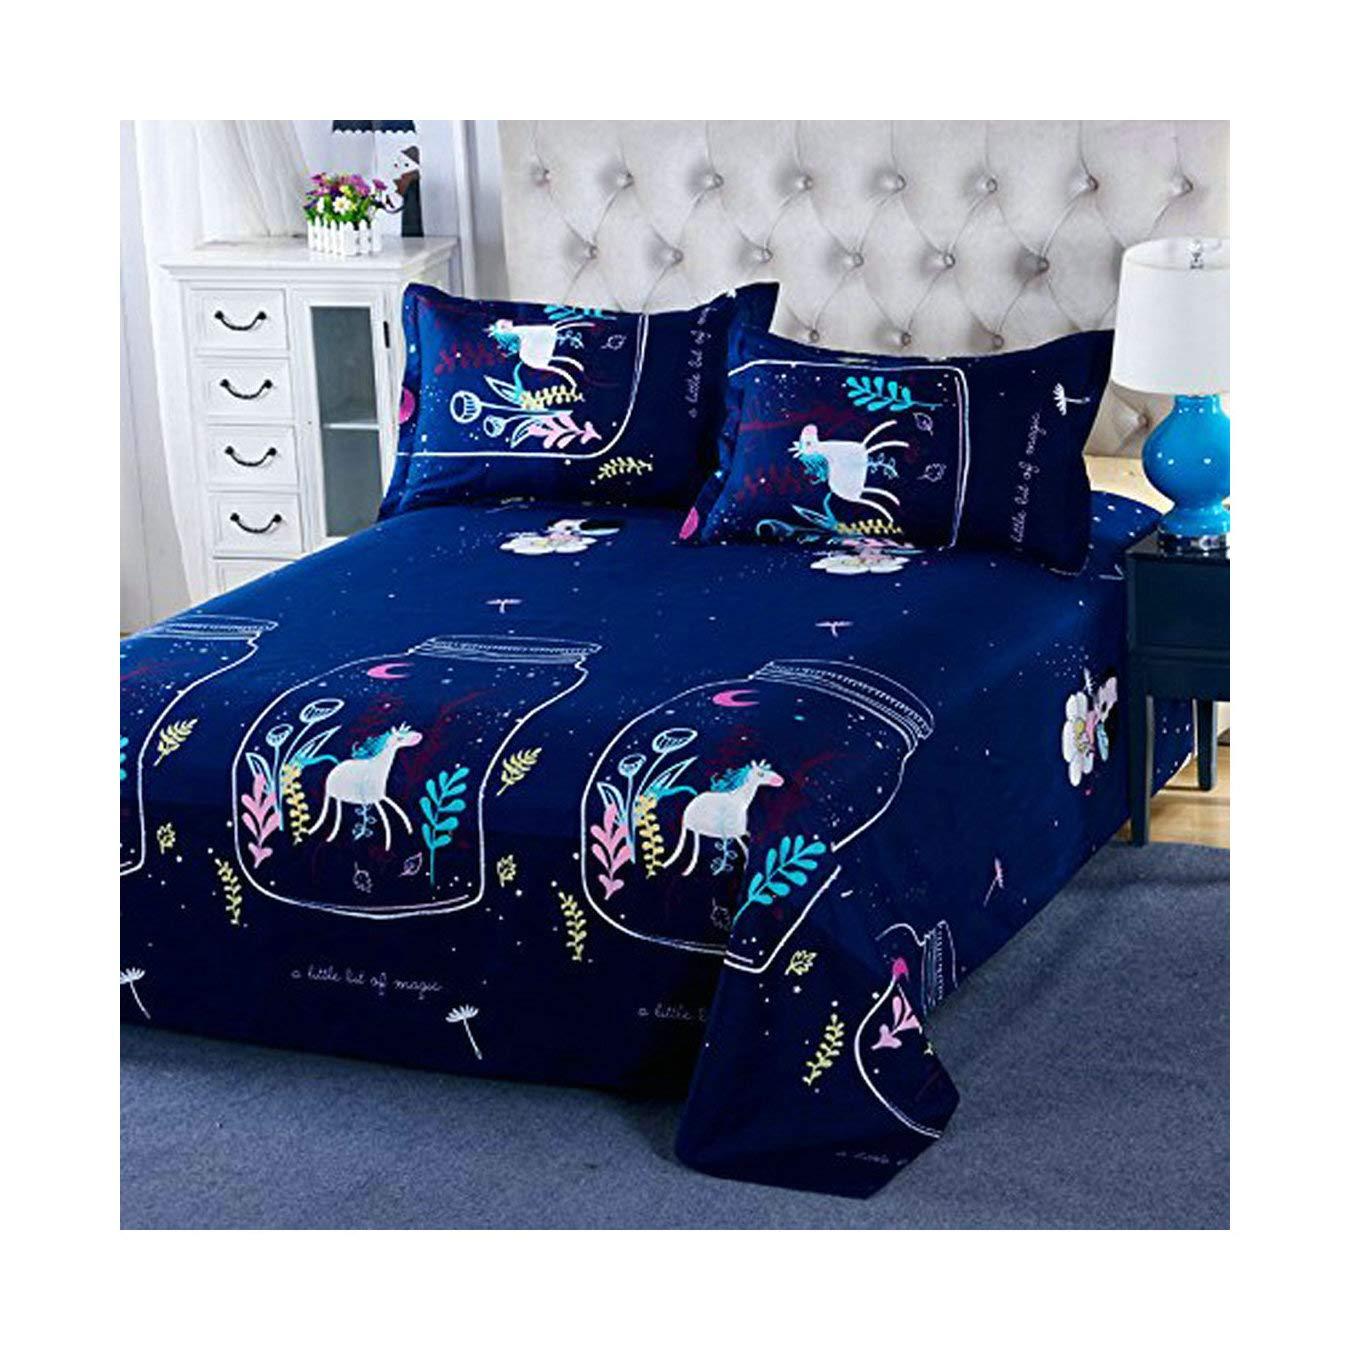 KFZ Bedding Duvet Cover Set Flat Sheet Pillowcases 4pcs/Set No Comforter SM Twin Full Queen King Cowboy Puppy Unicorn Star Dream Rabbit Luck Dog Design (Cowboy Puppy,Blue, Twin, 58x79, 3pcs) 58x79